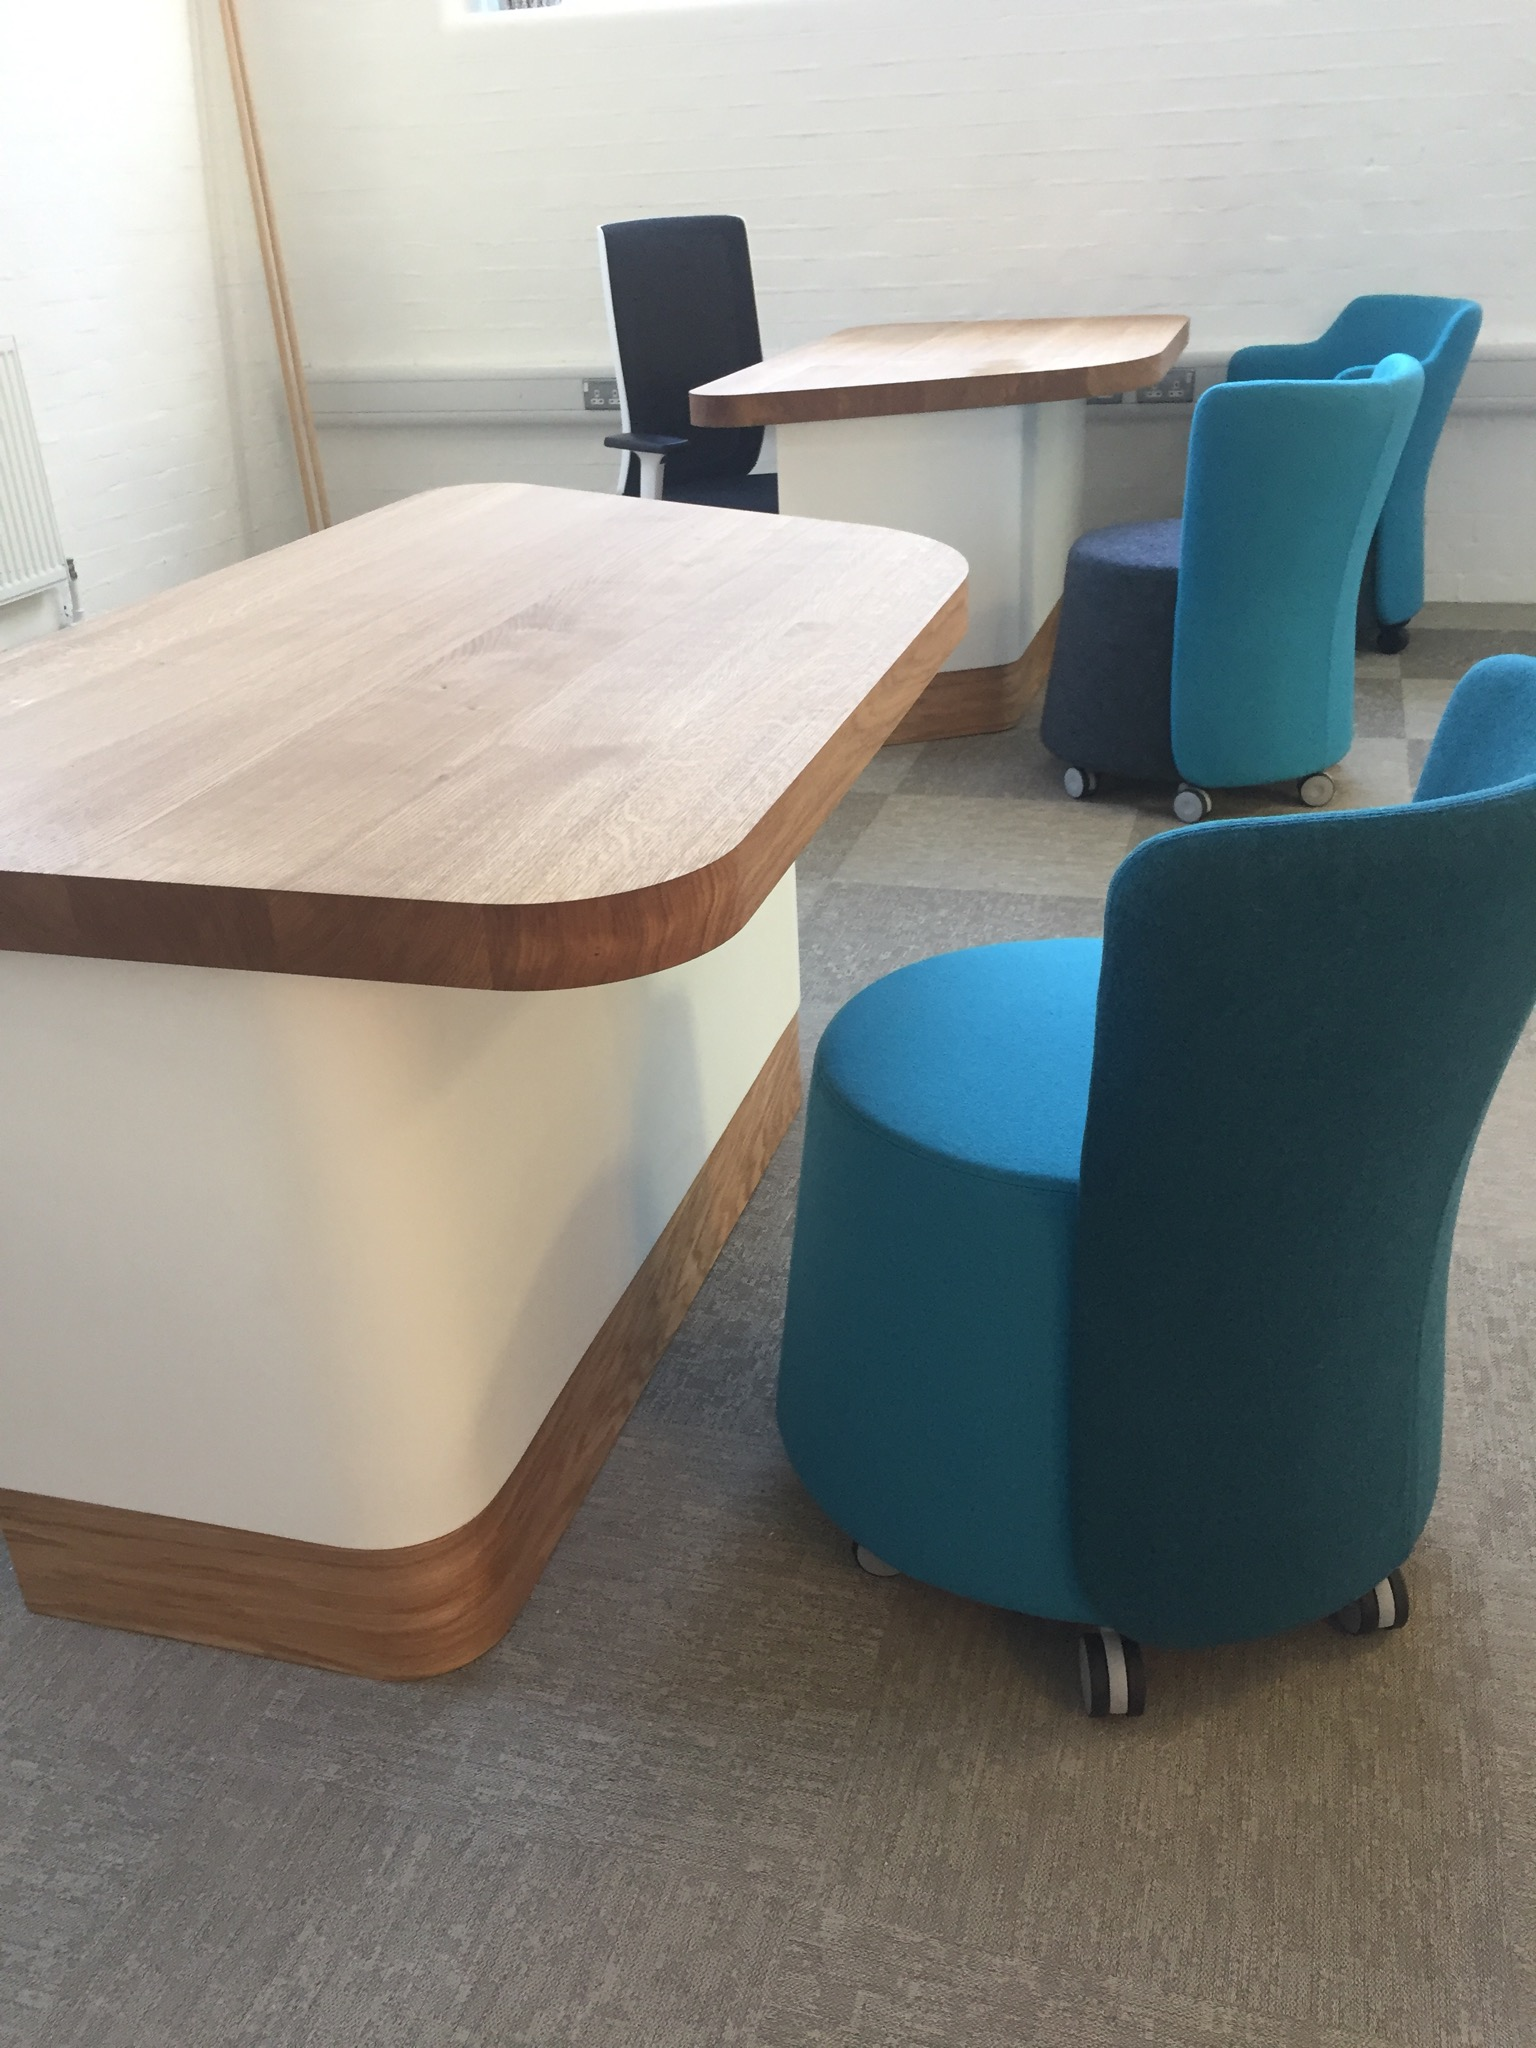 Tradetops timber desk